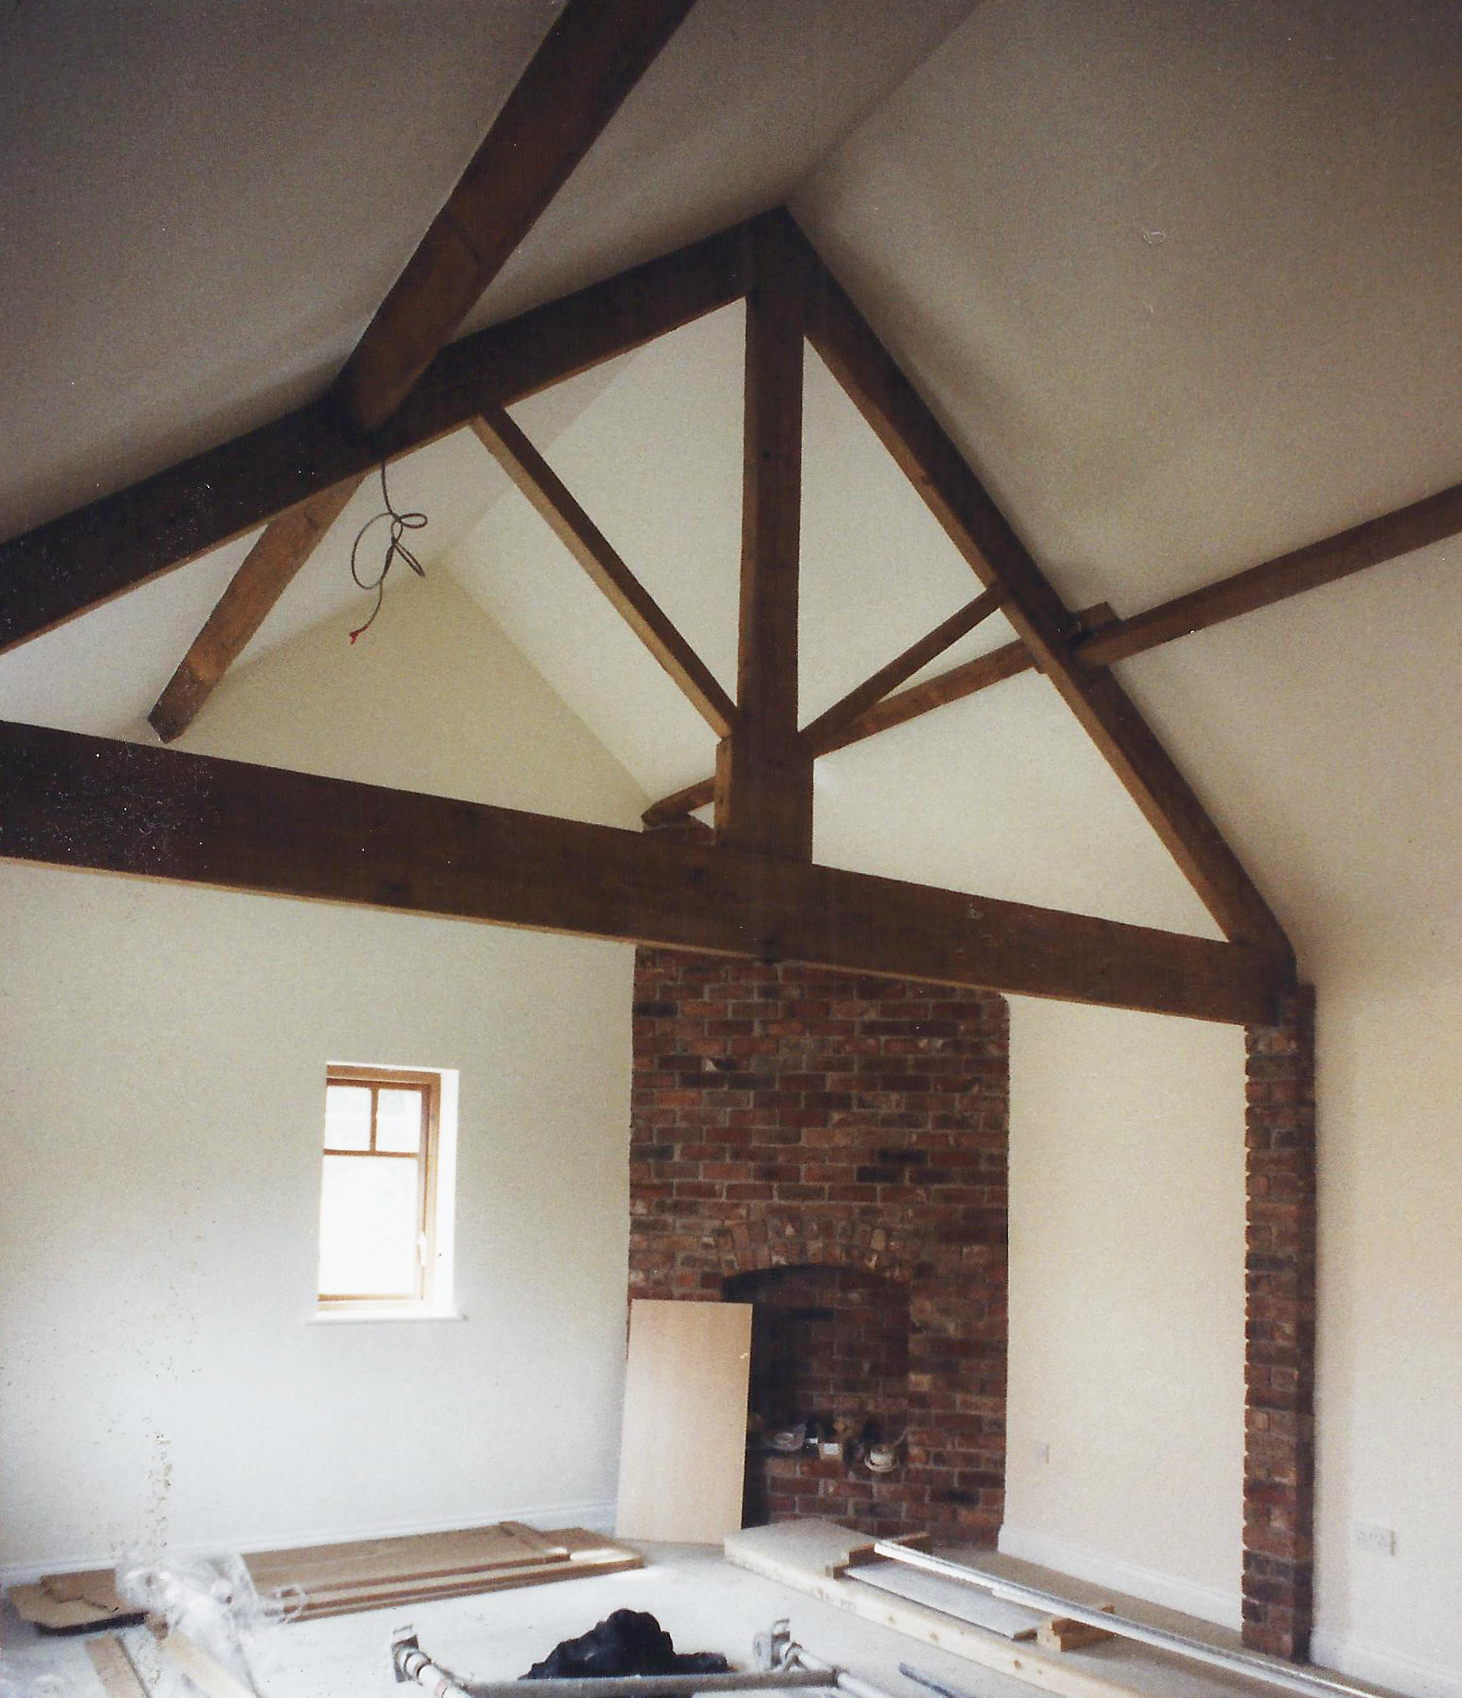 Brecks Farm Interior 1 - East Yorkshire Architects - Samuel Kendall Associates.jpg